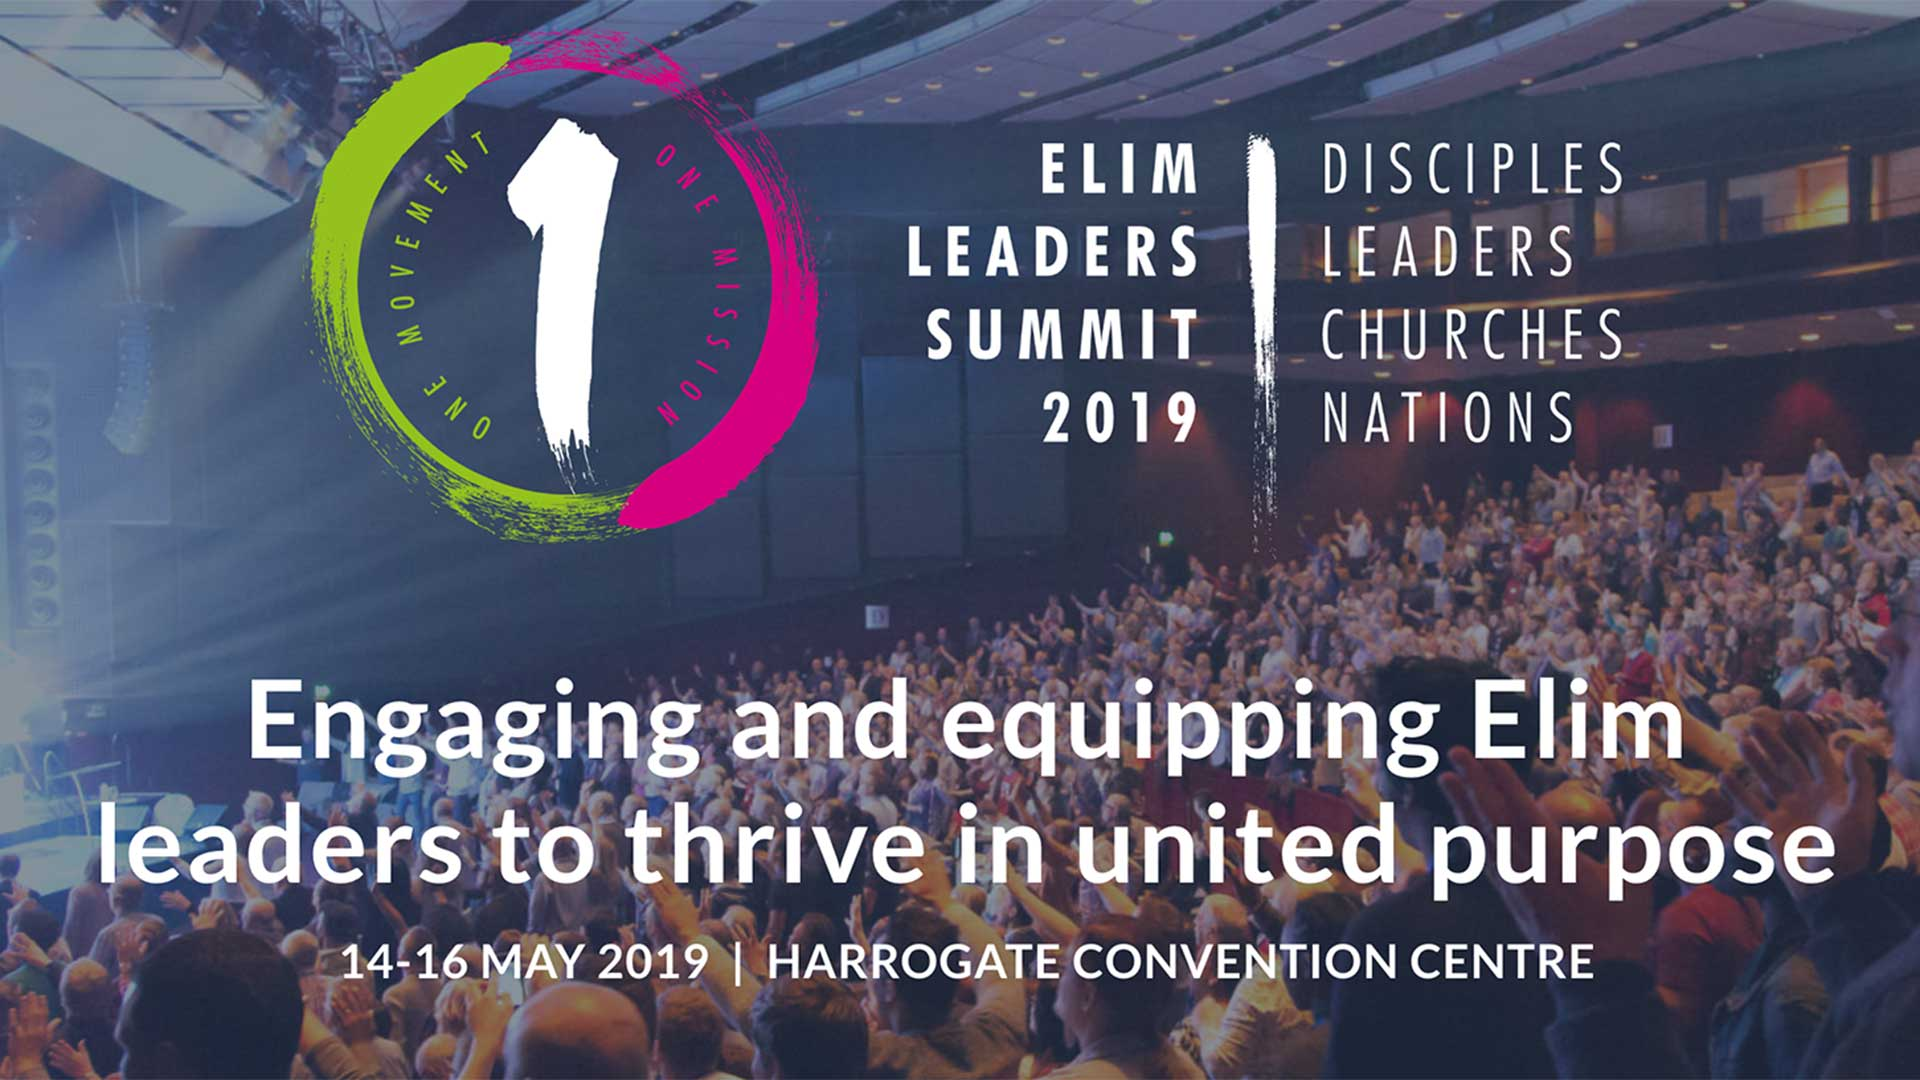 Elim Leaders Summit 2019